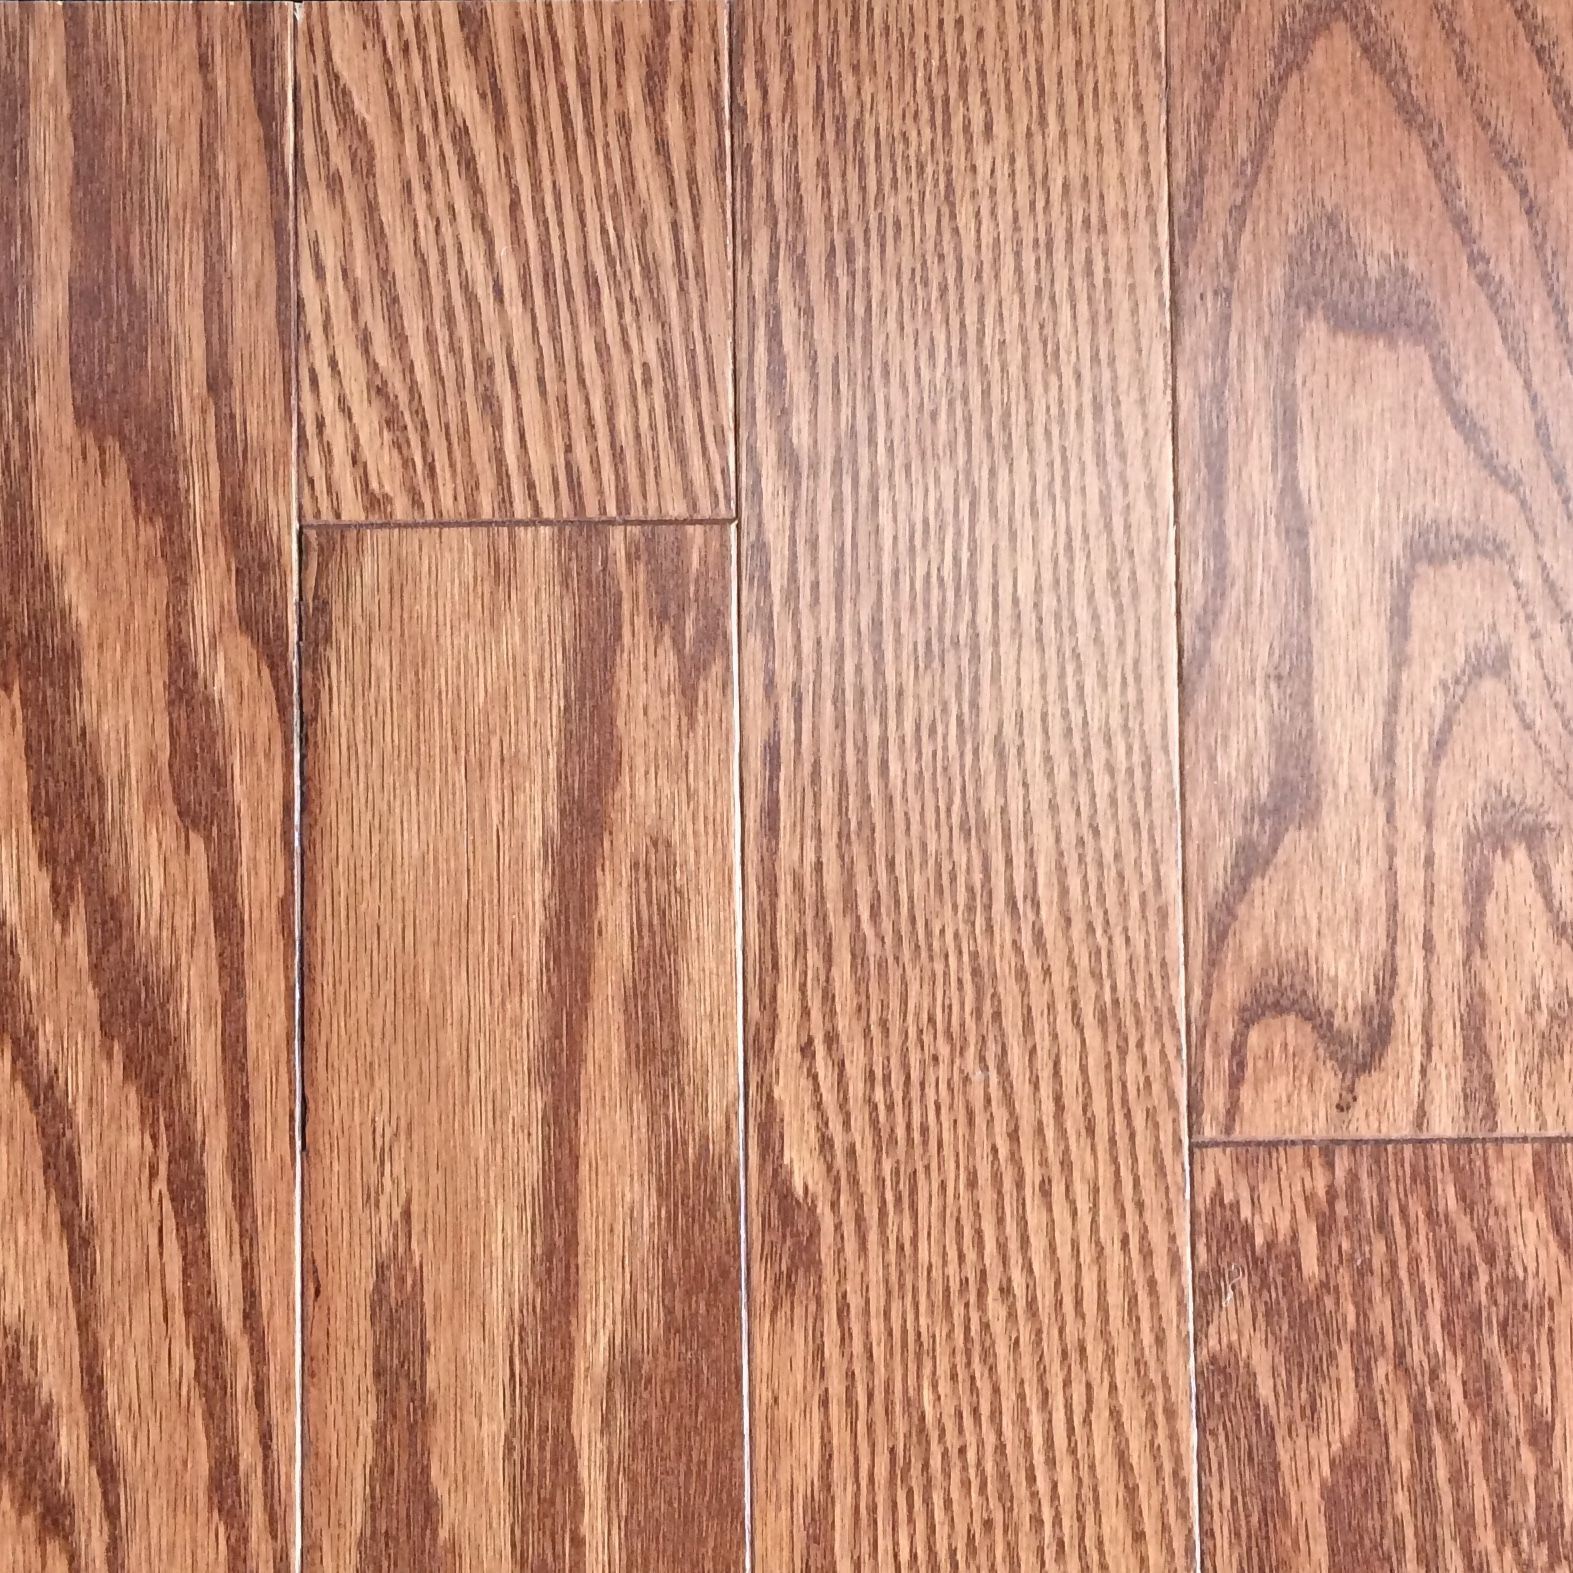 1 3 4 hardwood floors of level 1 engineered hardwood 3 1 4 spokane oak gunstock with regard to level 1 engineered hardwood 3 1 4 spokane oak gunstock